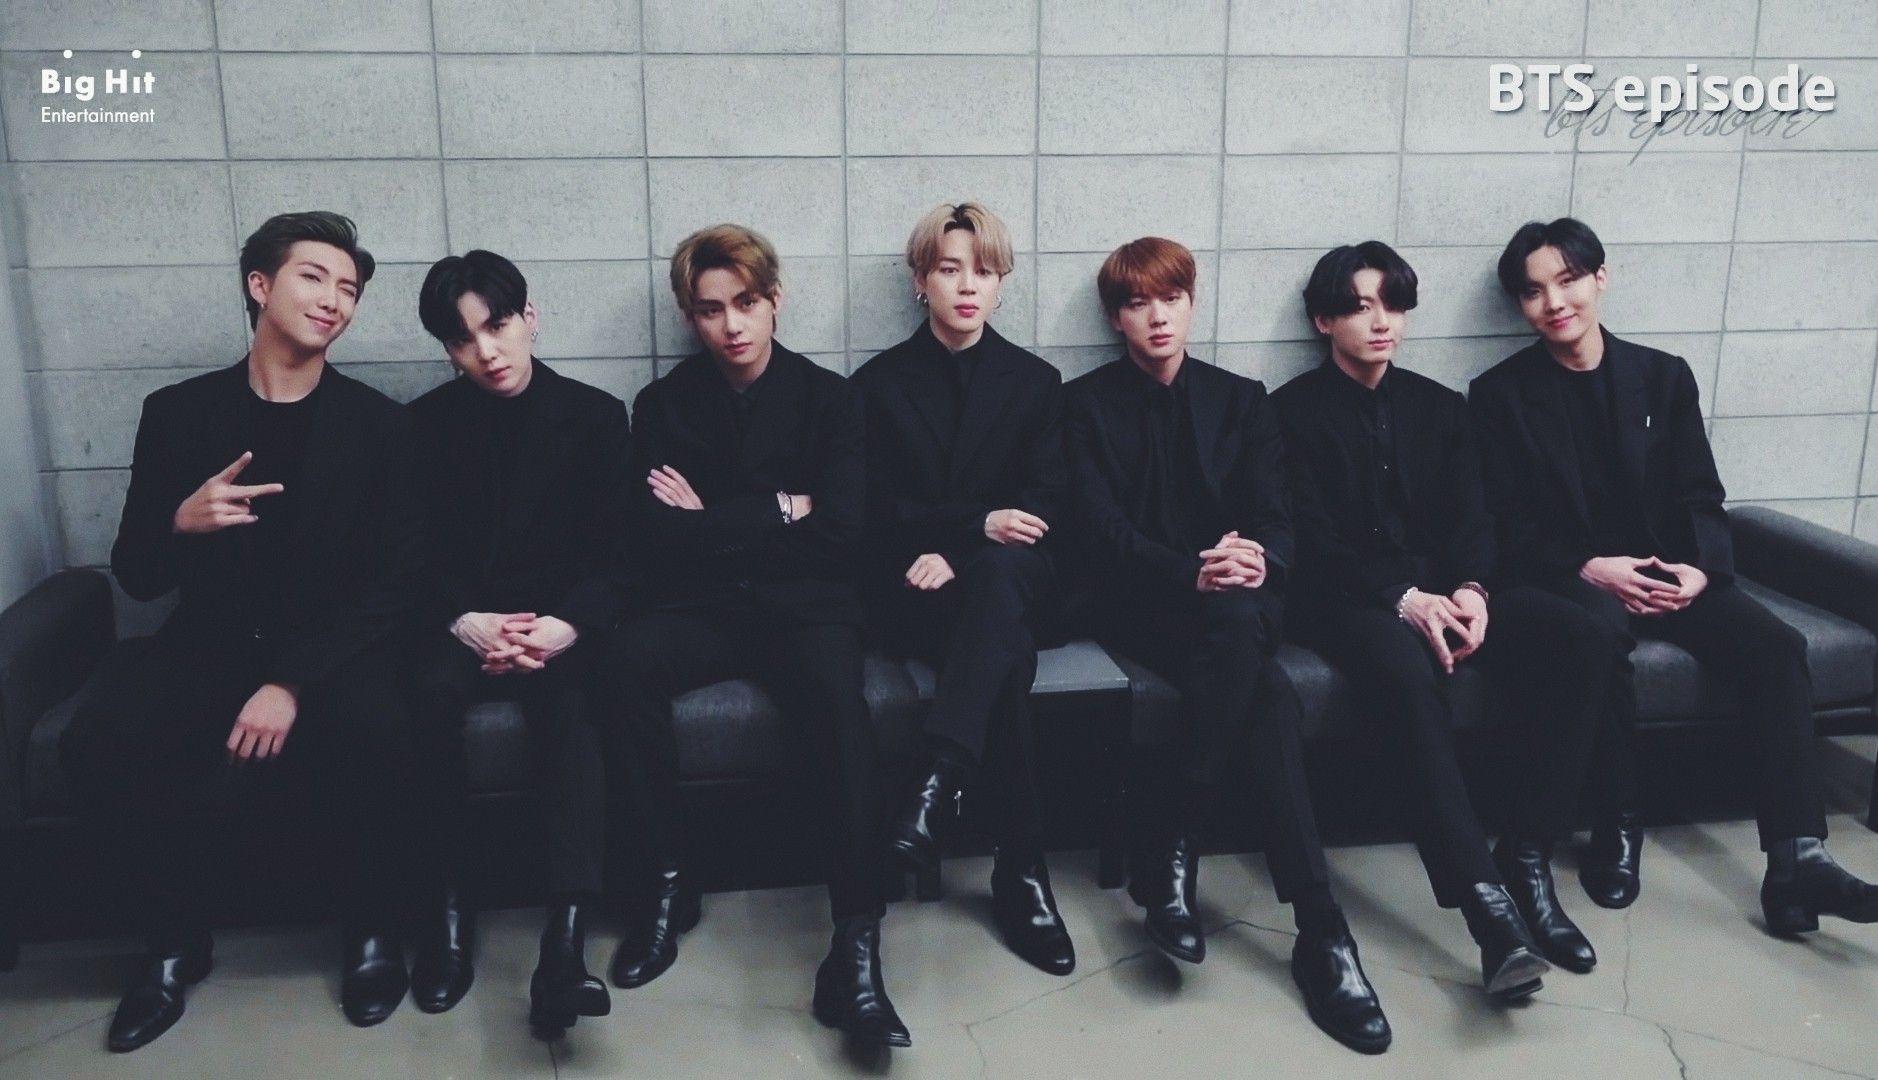 #BTSpics #Namjoon #Jin #Yoongi#Hoseok #Jimin#Taehyung #Jungkook